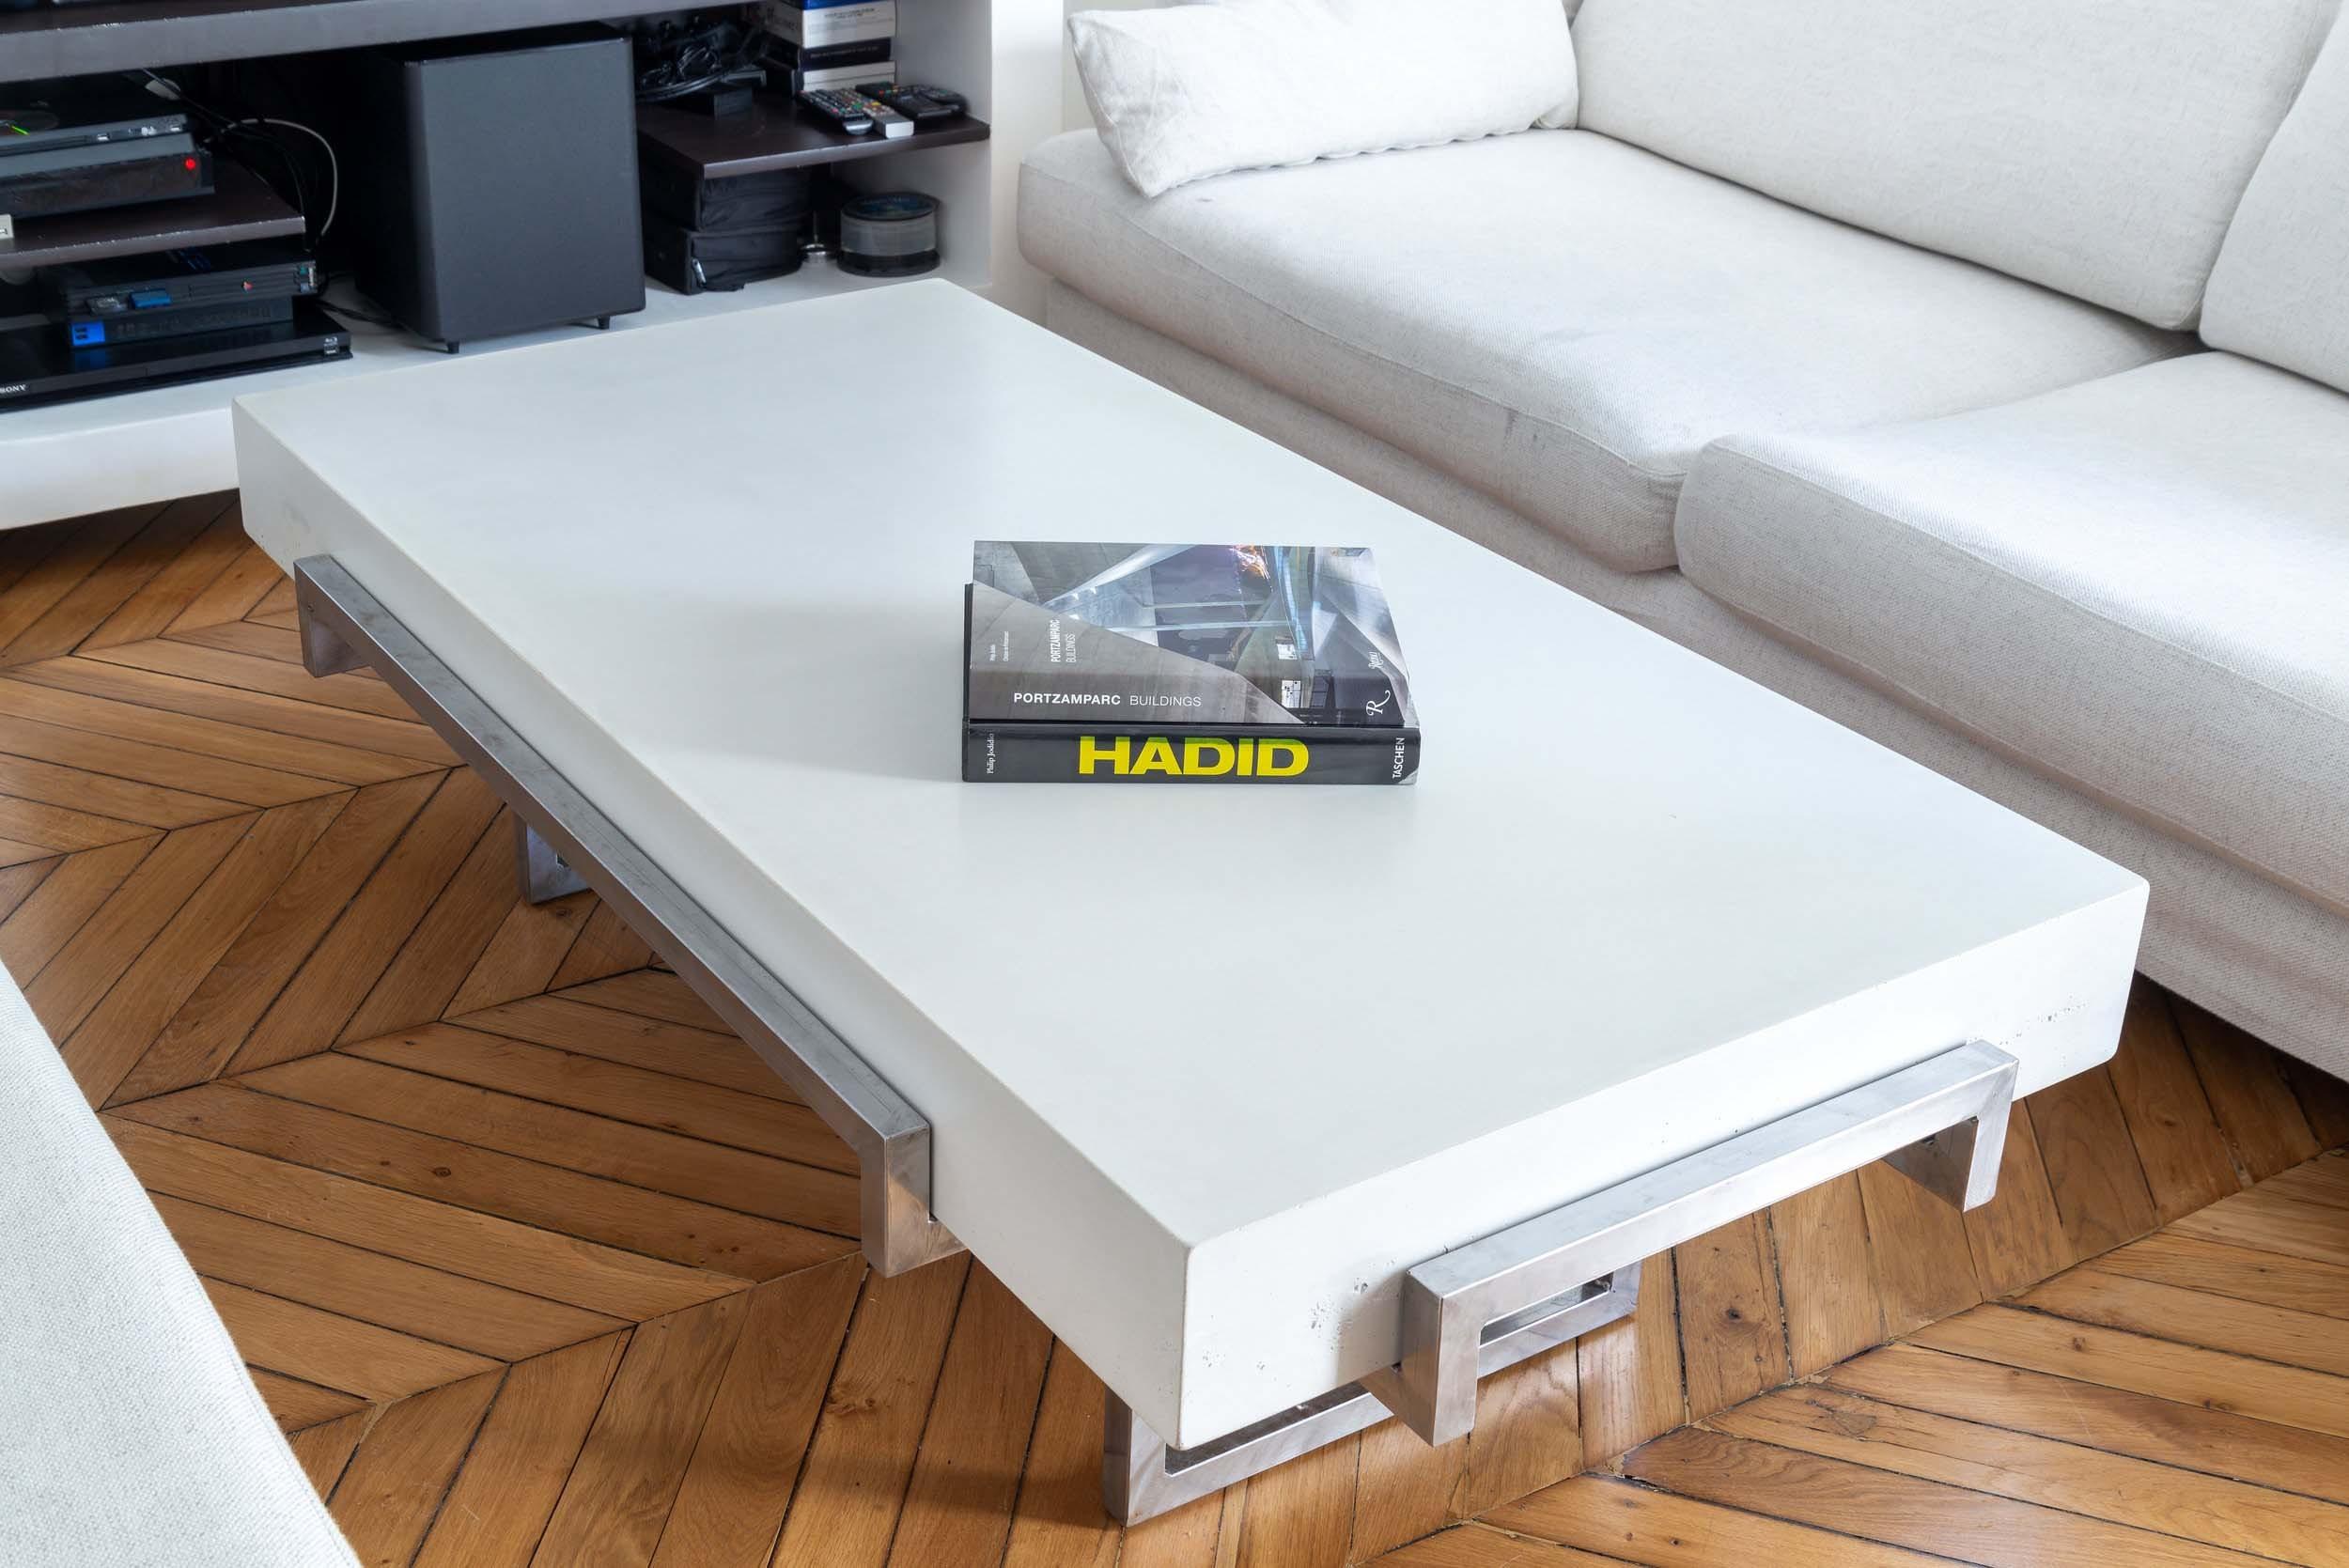 Table b insert